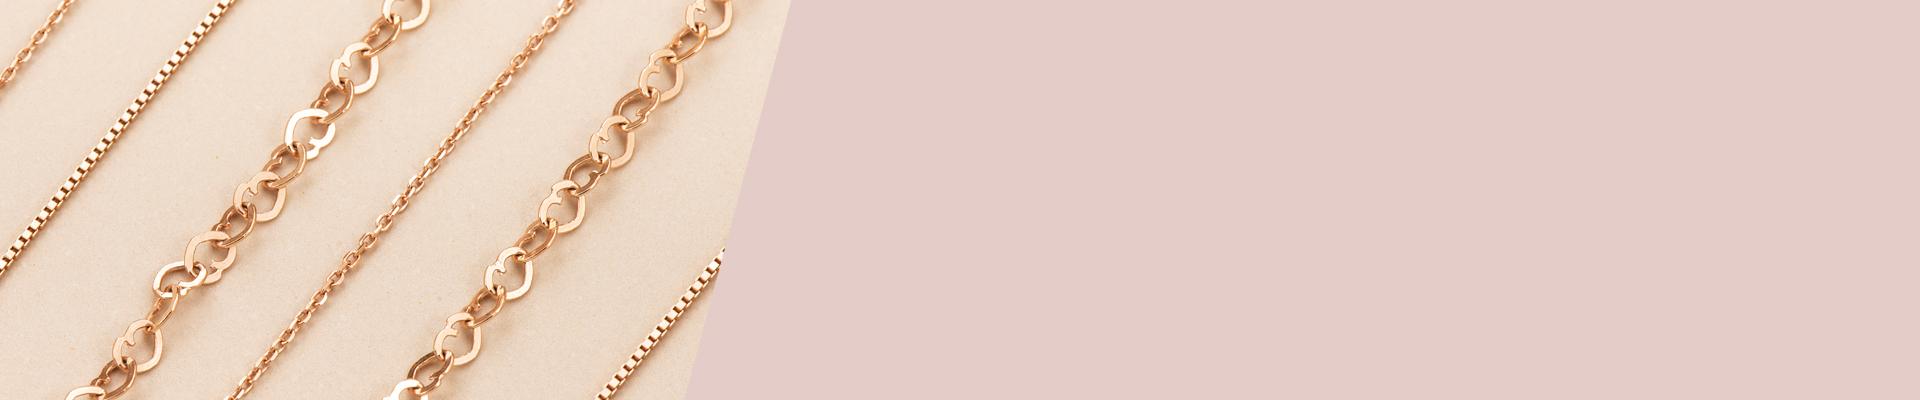 corrente-ouro-rose